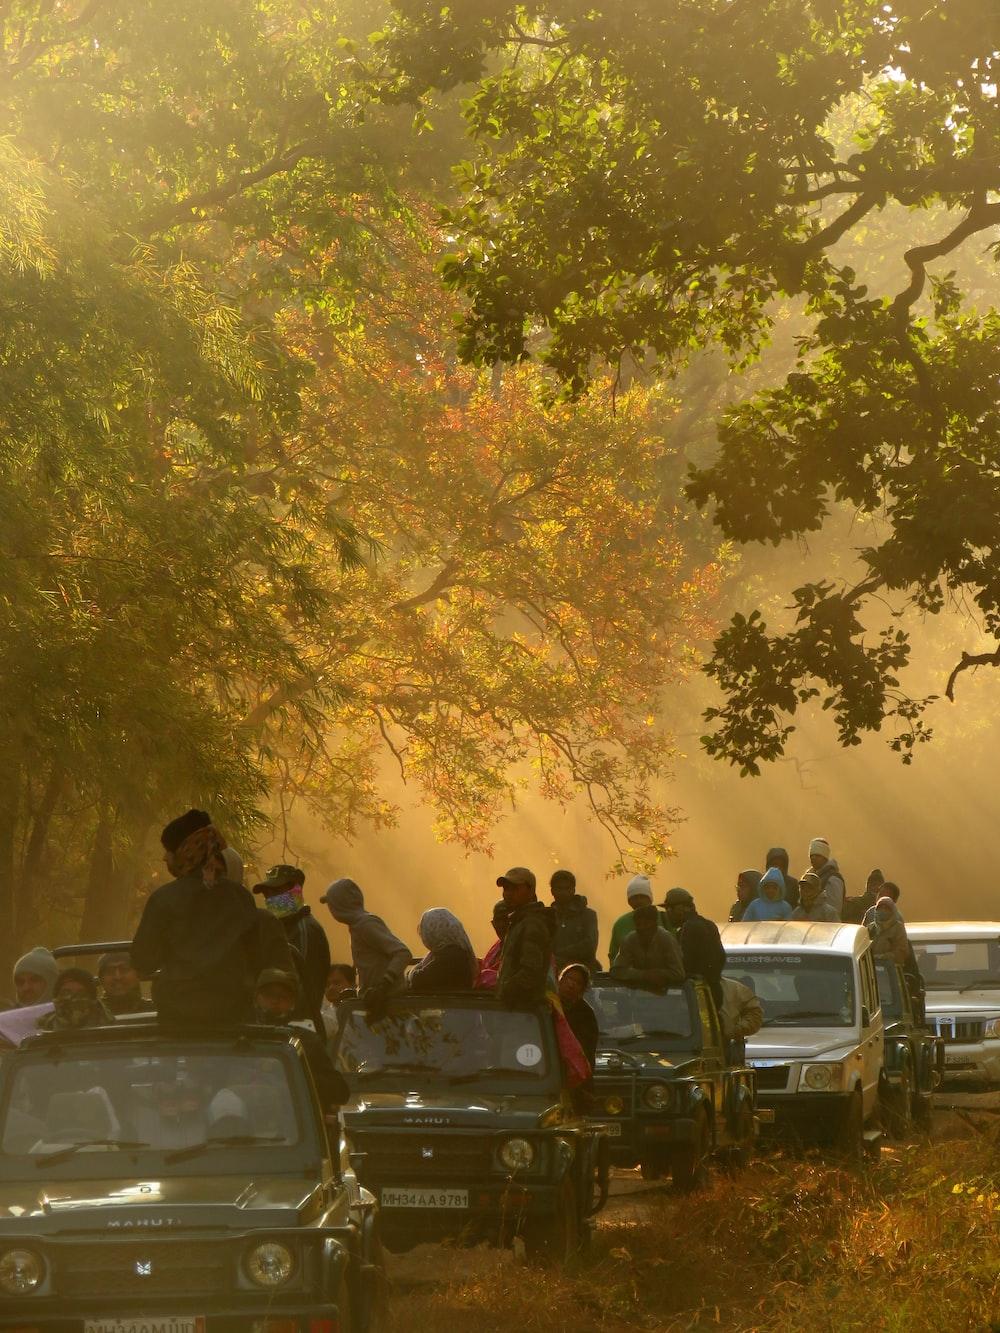 people on cars beside trees